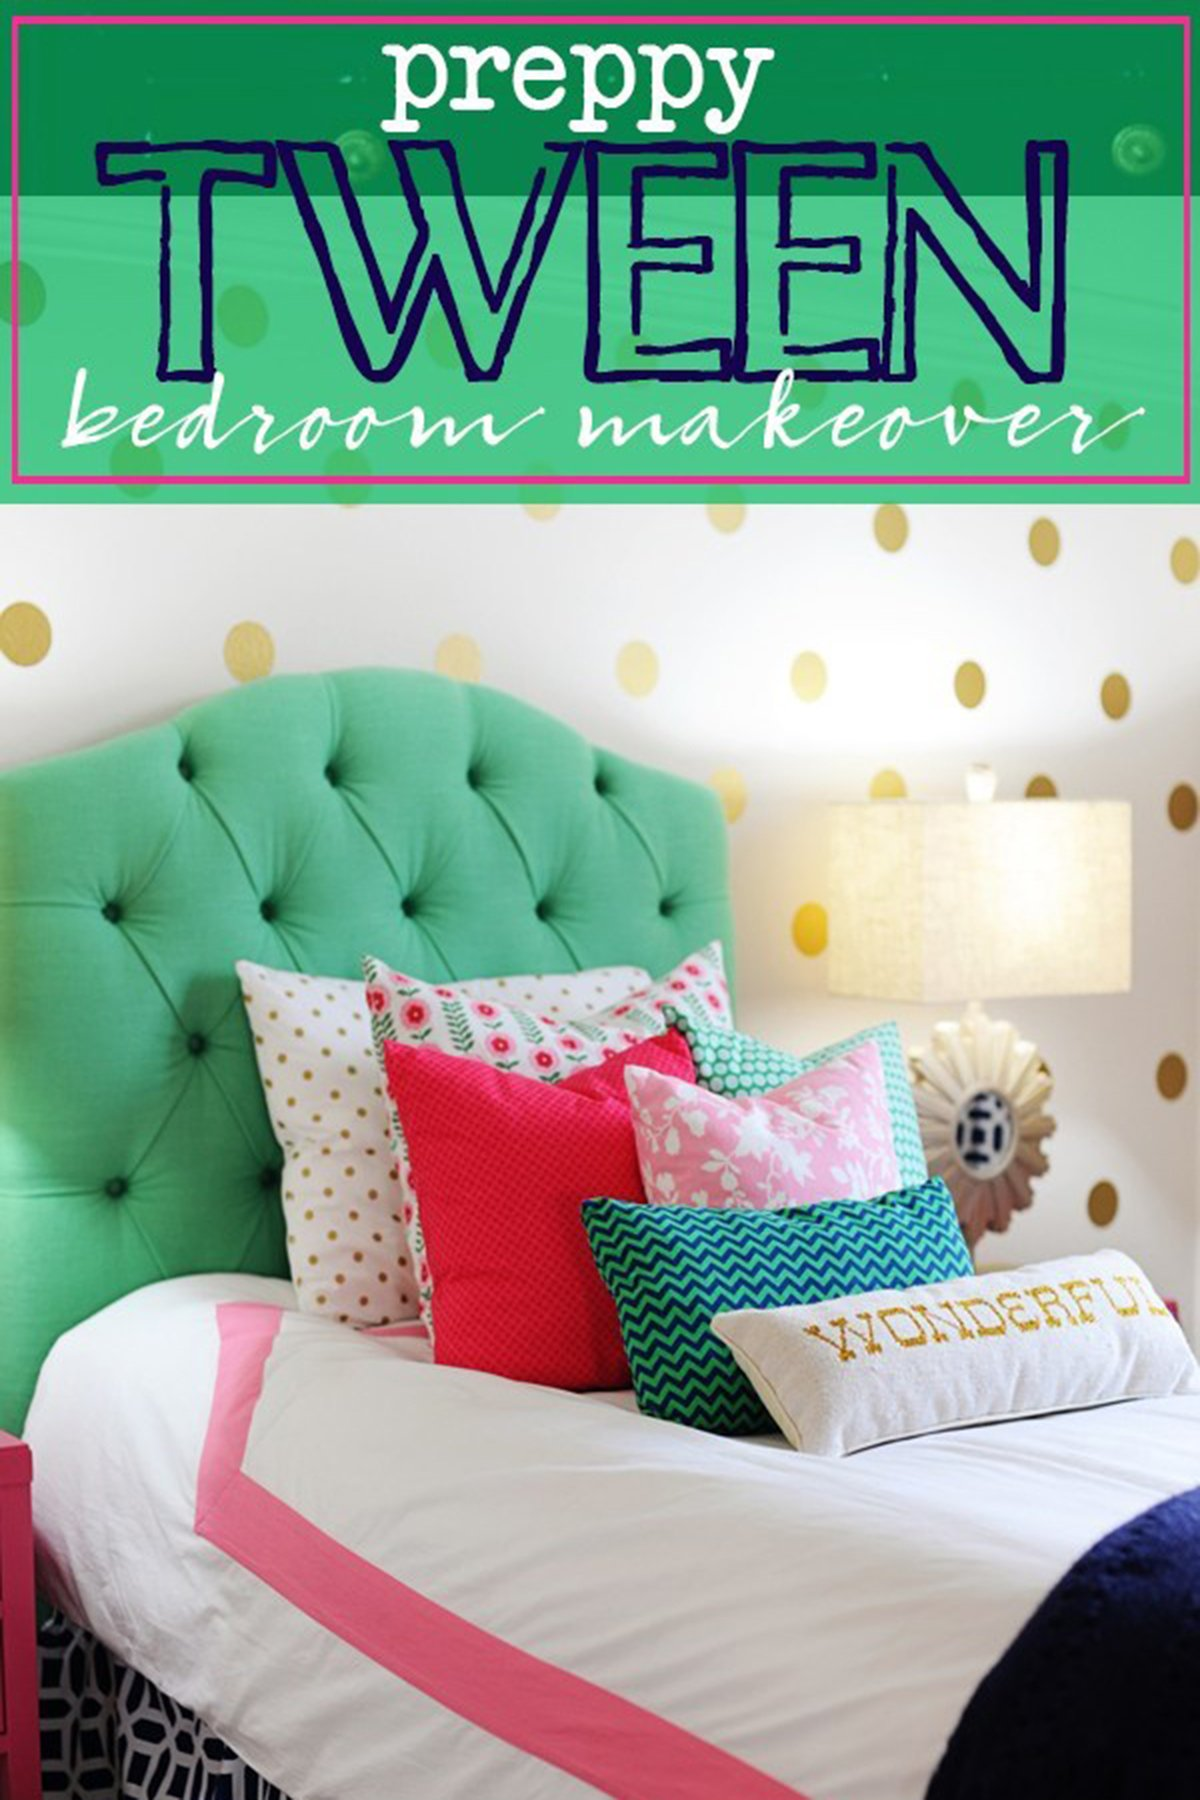 Preppy teen bedroom decorating ideas